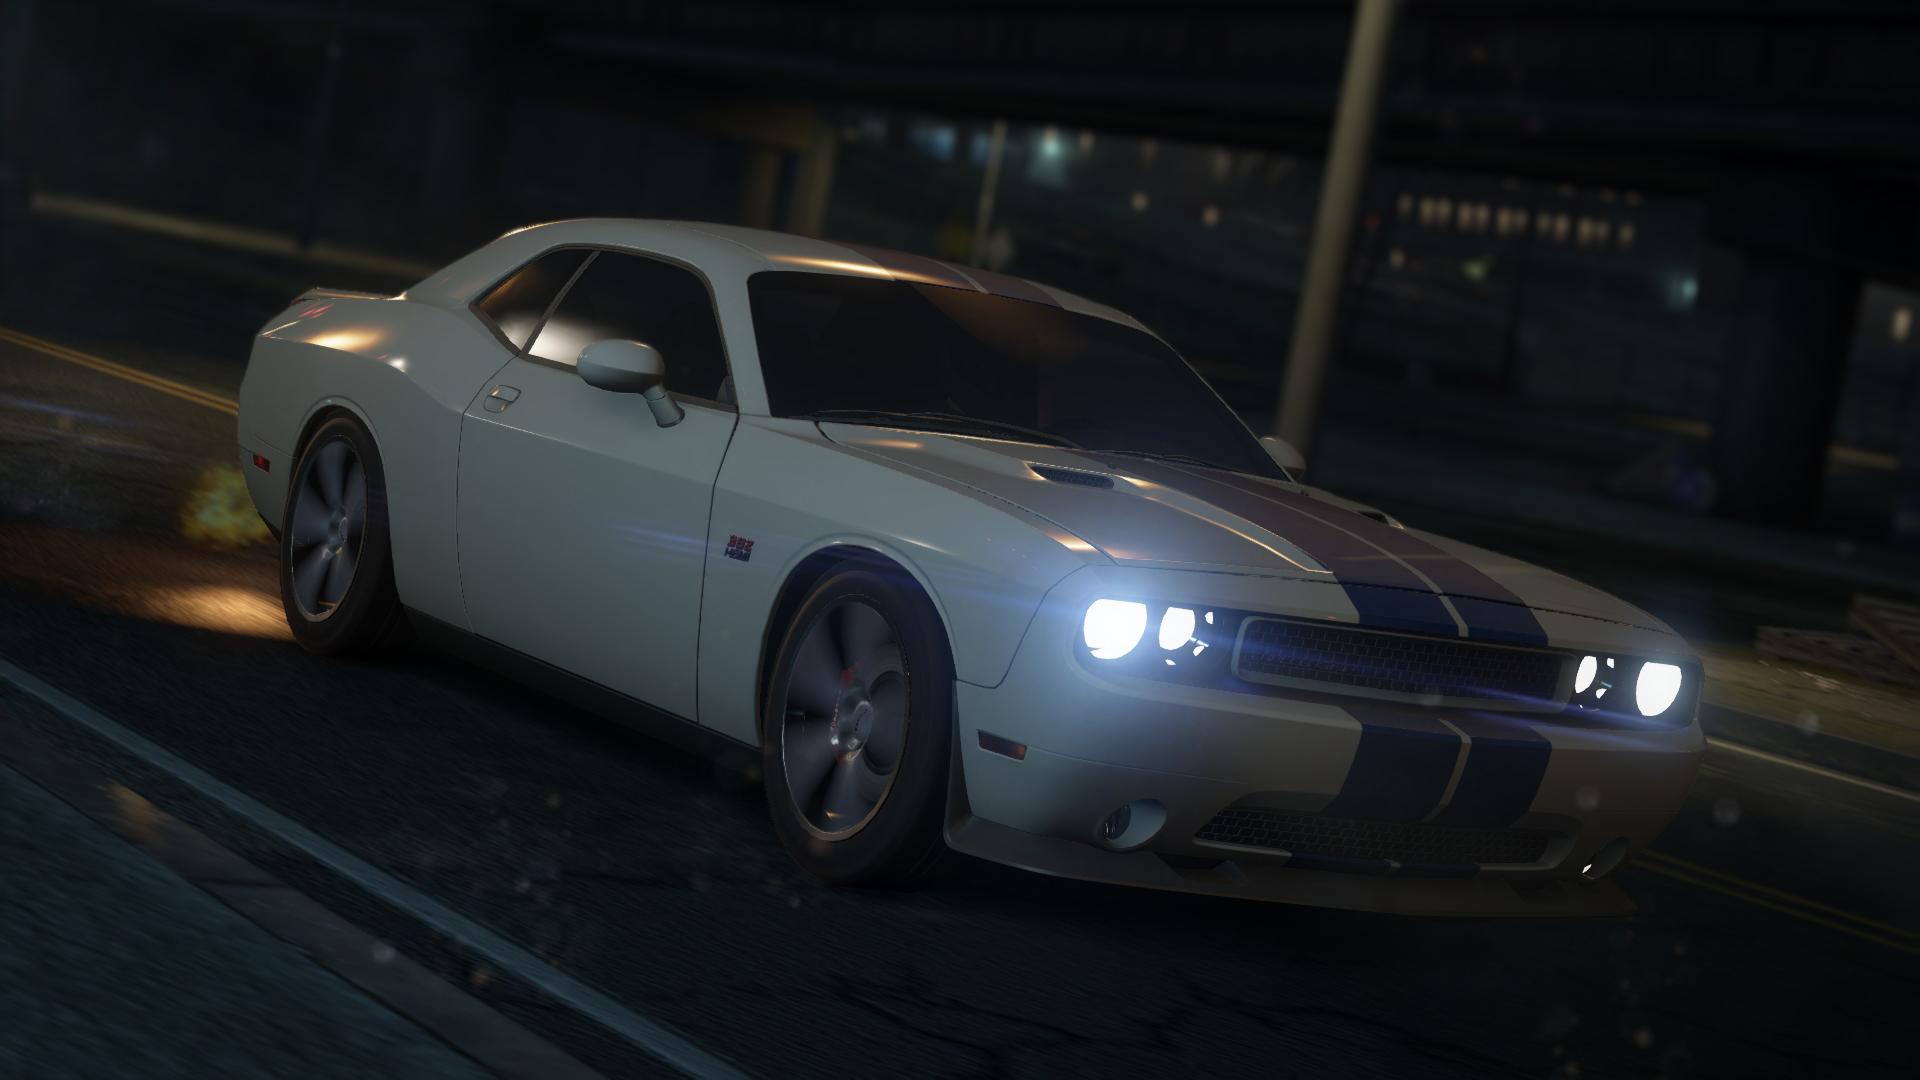 dodge challenger srt8 392 need for speed wiki fandom powered by wikia - Dodge Challenger 2015 Srt8